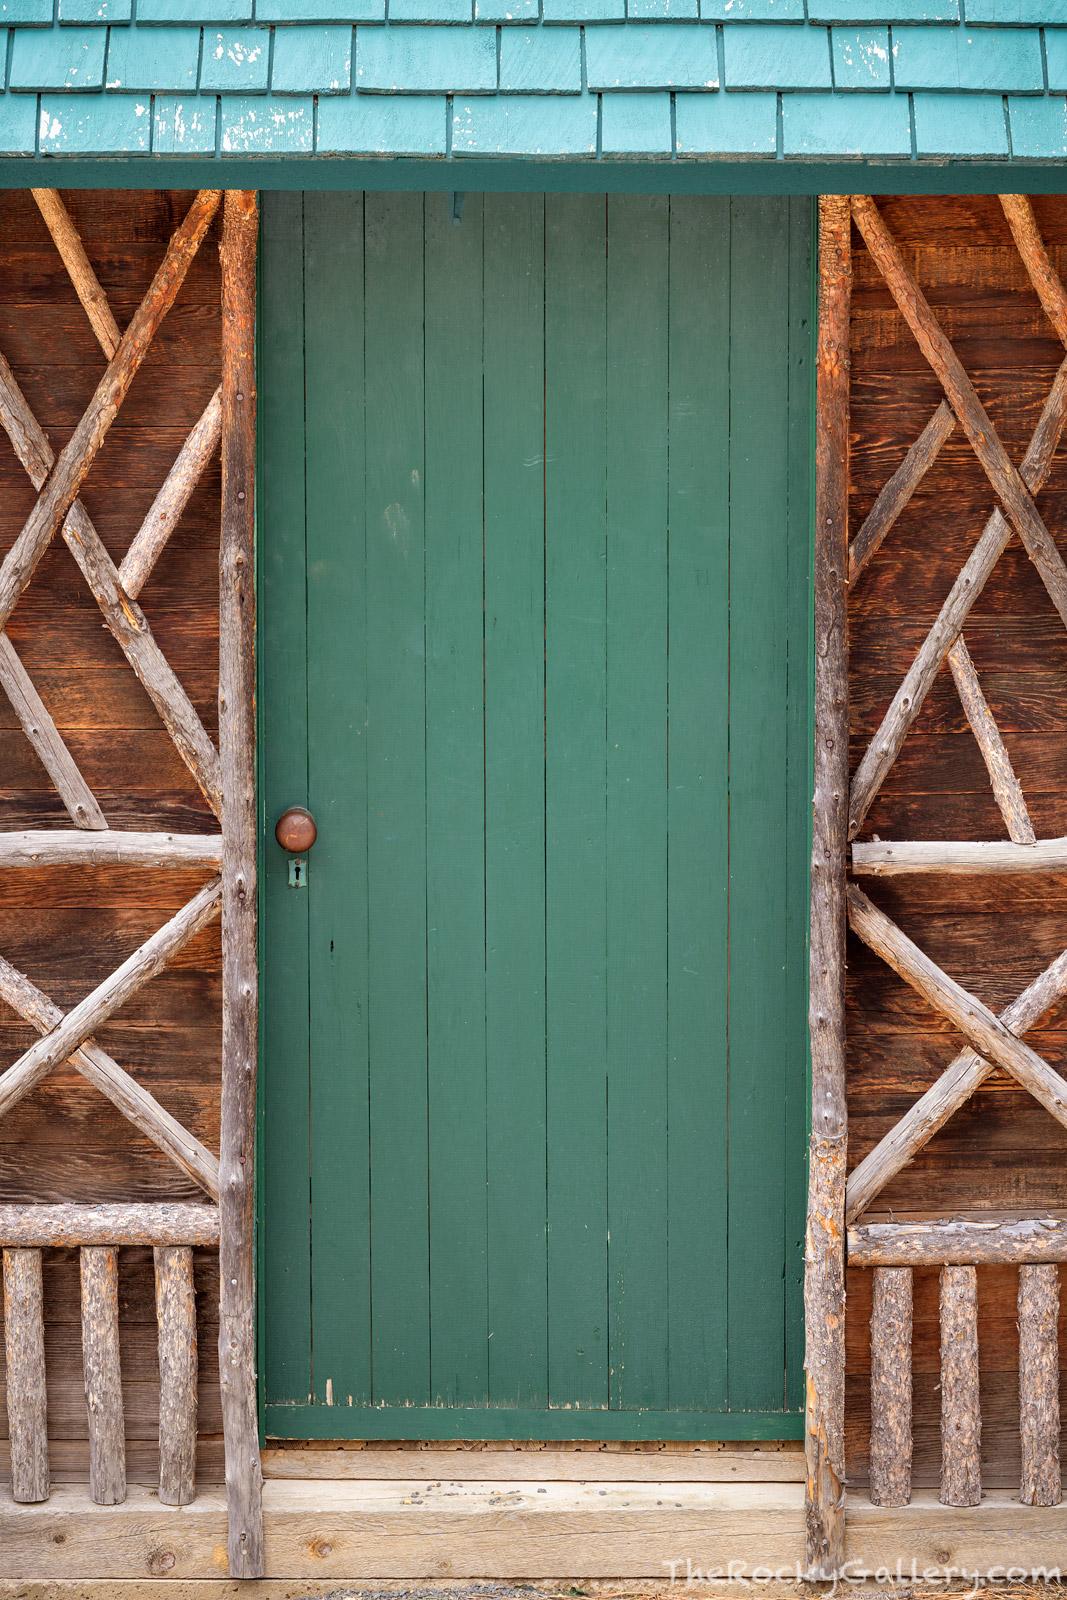 McGraw Ranch, Indian Head,Lumpy Ridge,Colorado,Dude Ranch,RMNP,Rocky Mountain National Park,Landscape,Photography,January,Door,Hand of Man,Estes Park,National Historic Register,Outhouse,Bridal Veil Fa, photo